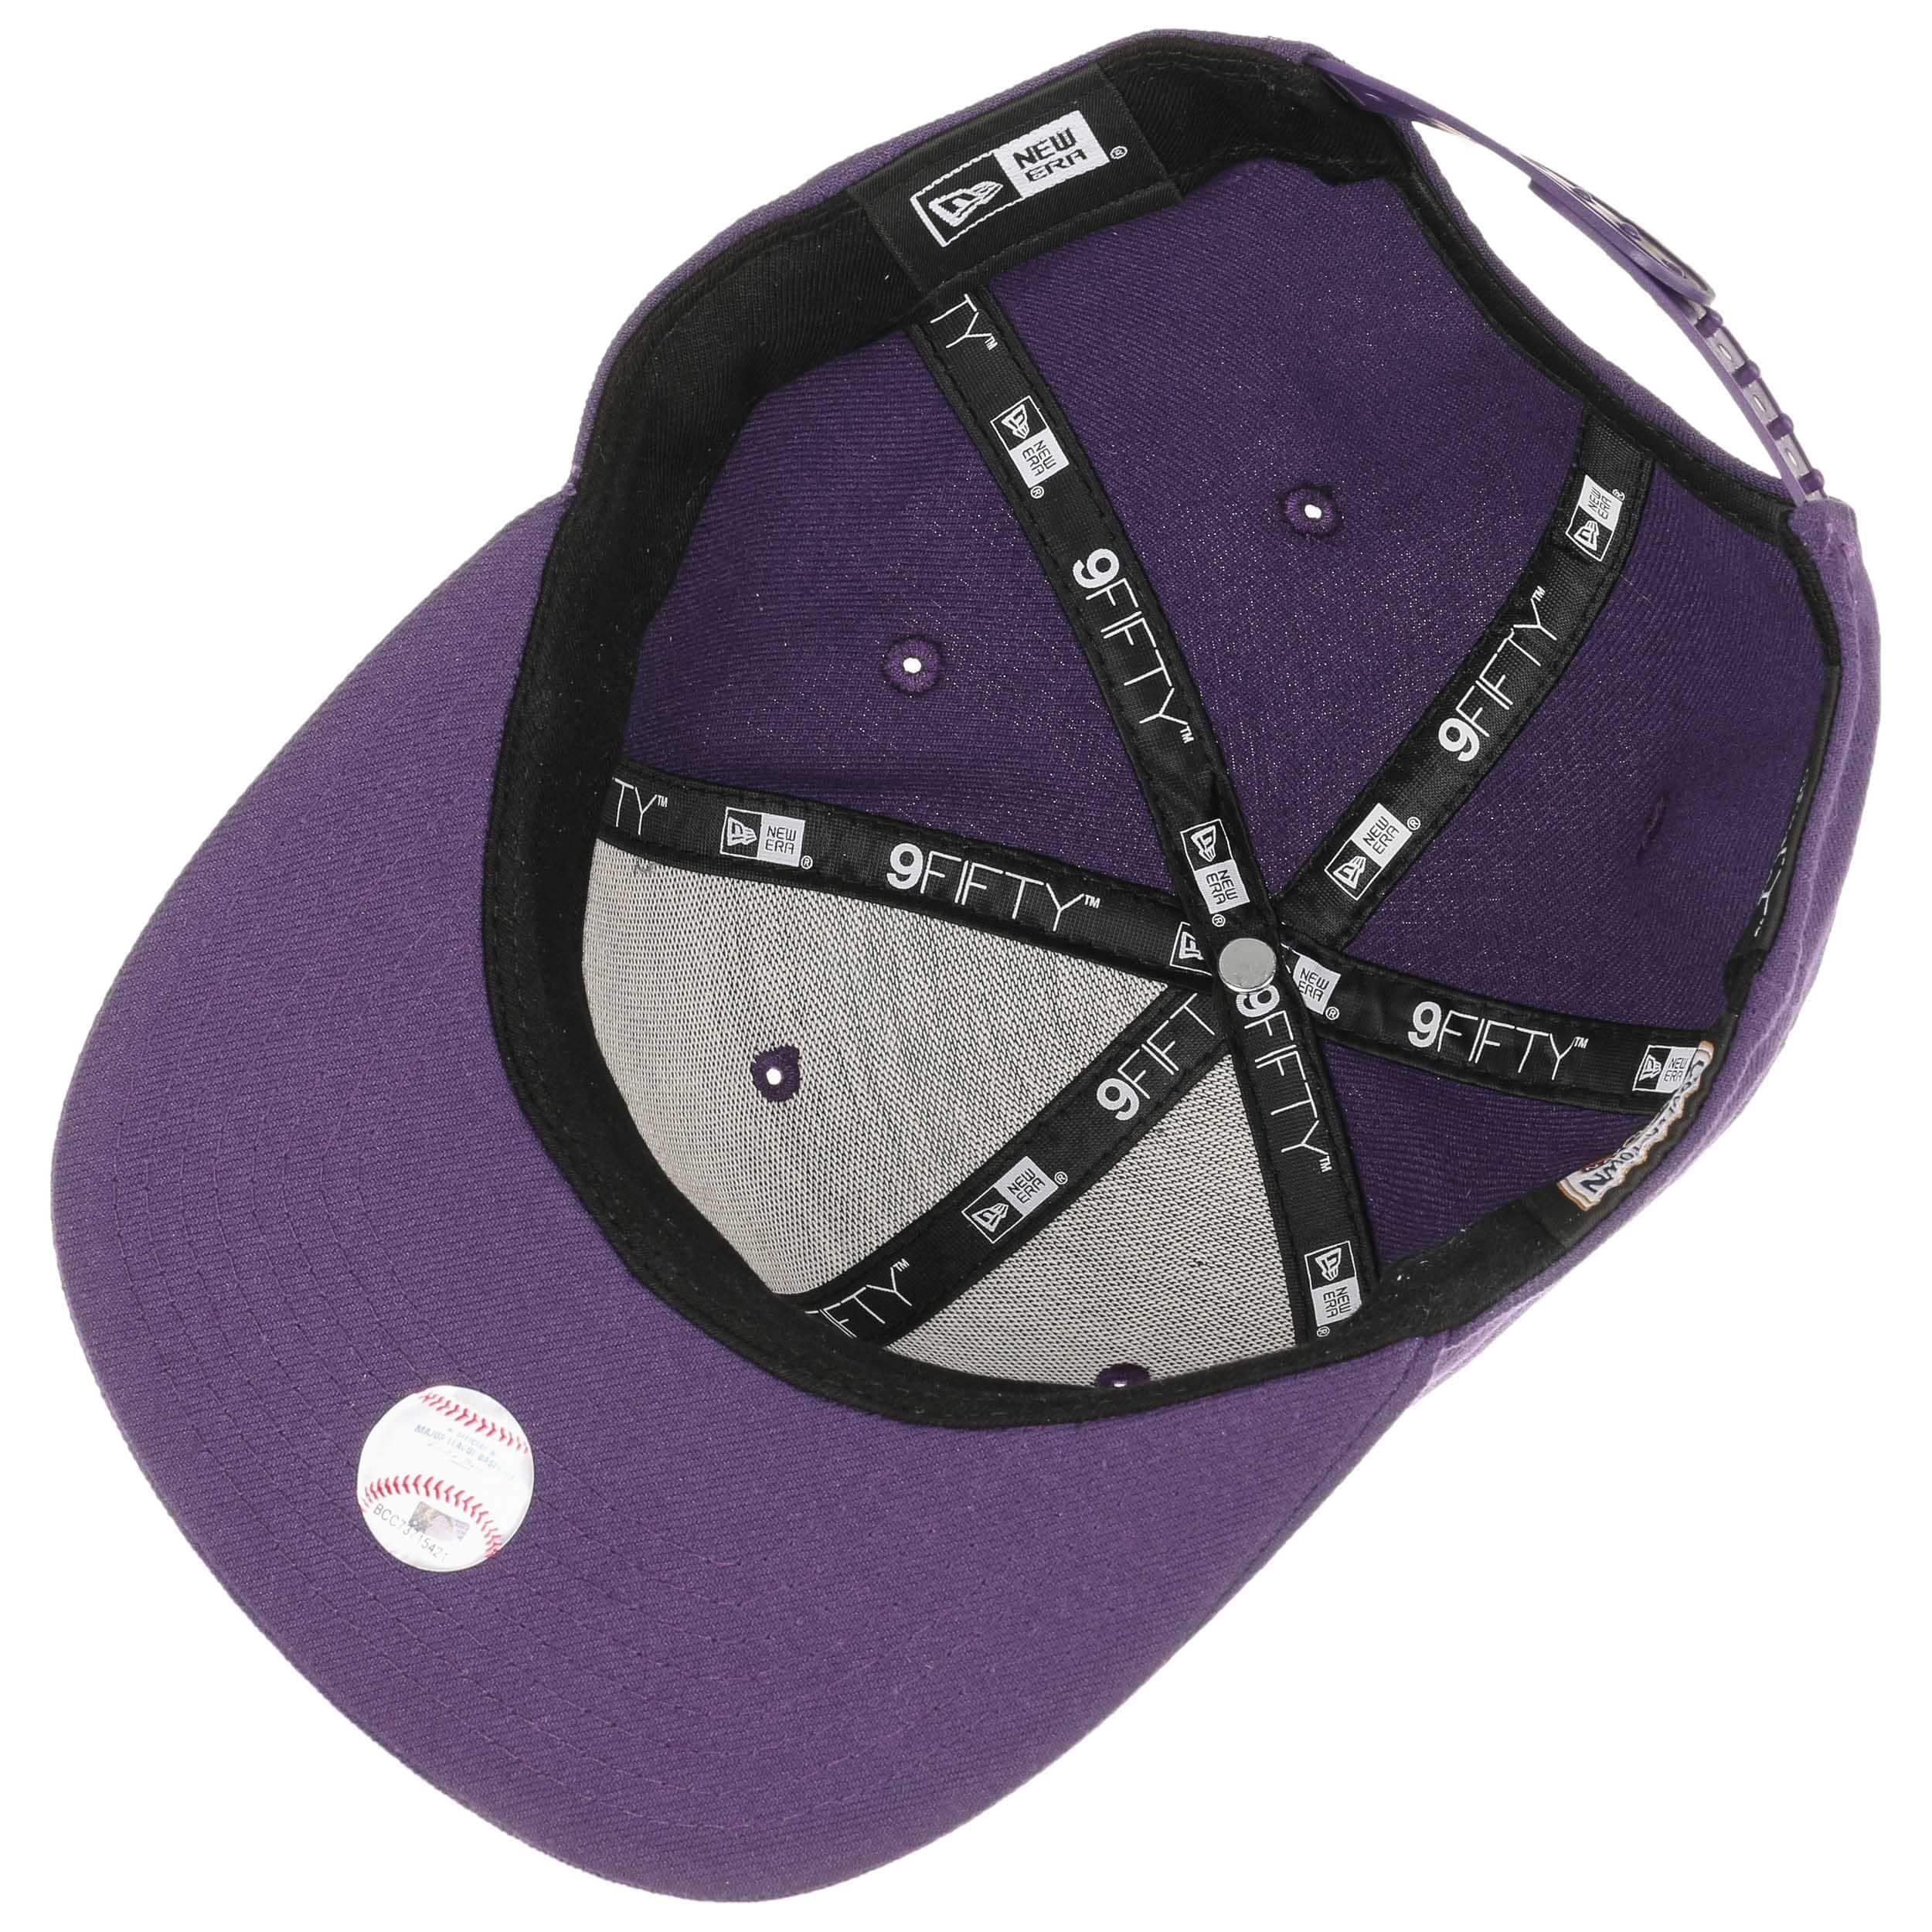 Gorra 9Fifty C2C Diamondbacks by New Era - Gorras - sombreroshop.es 716a1d725ca